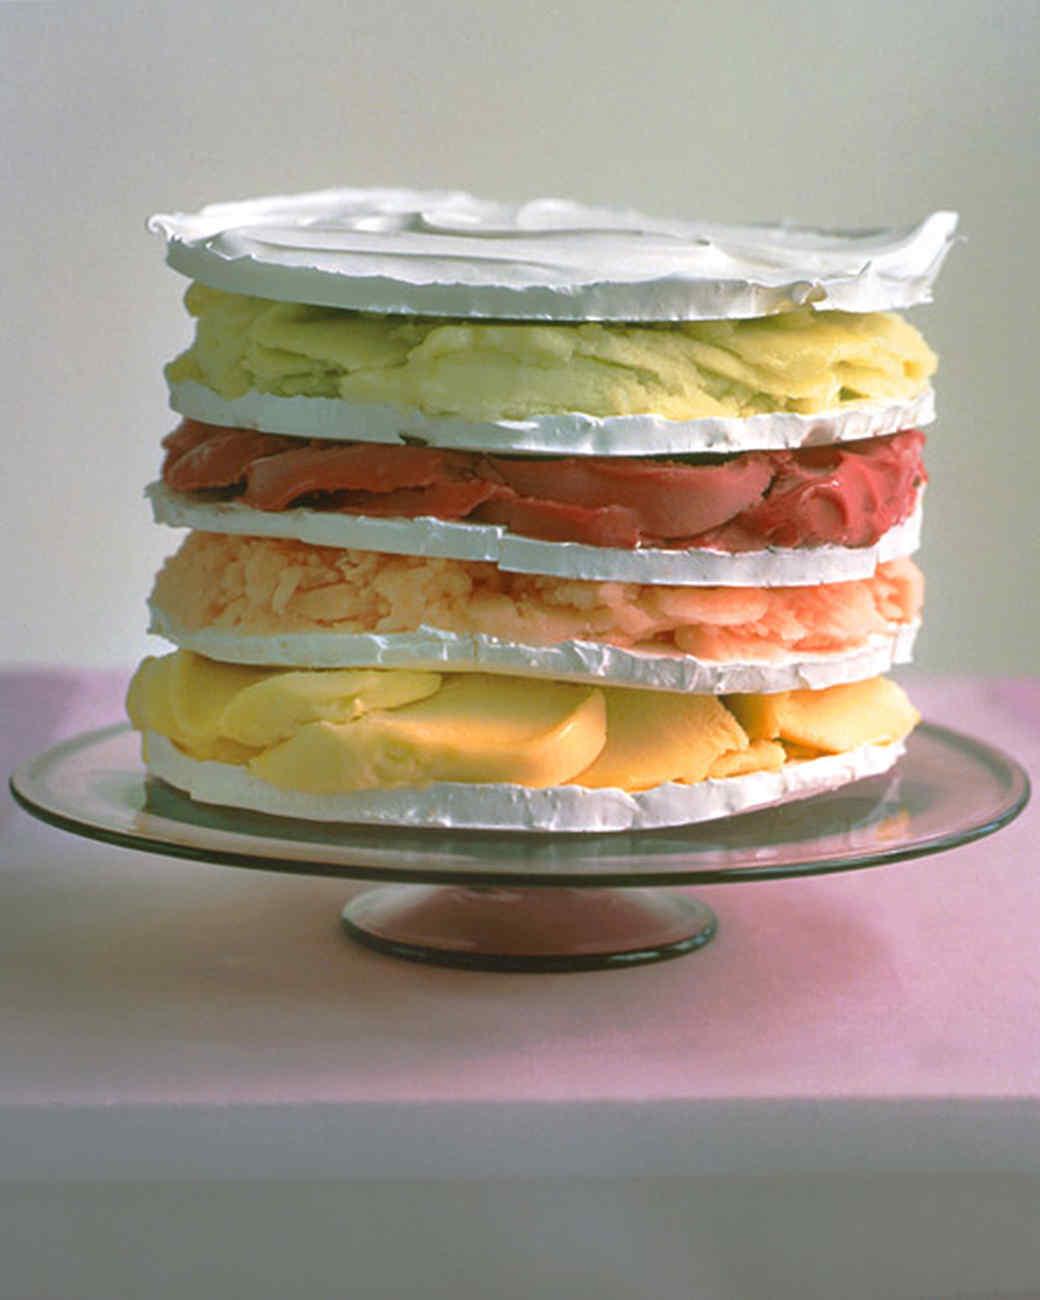 cakes_00144_t.jpg